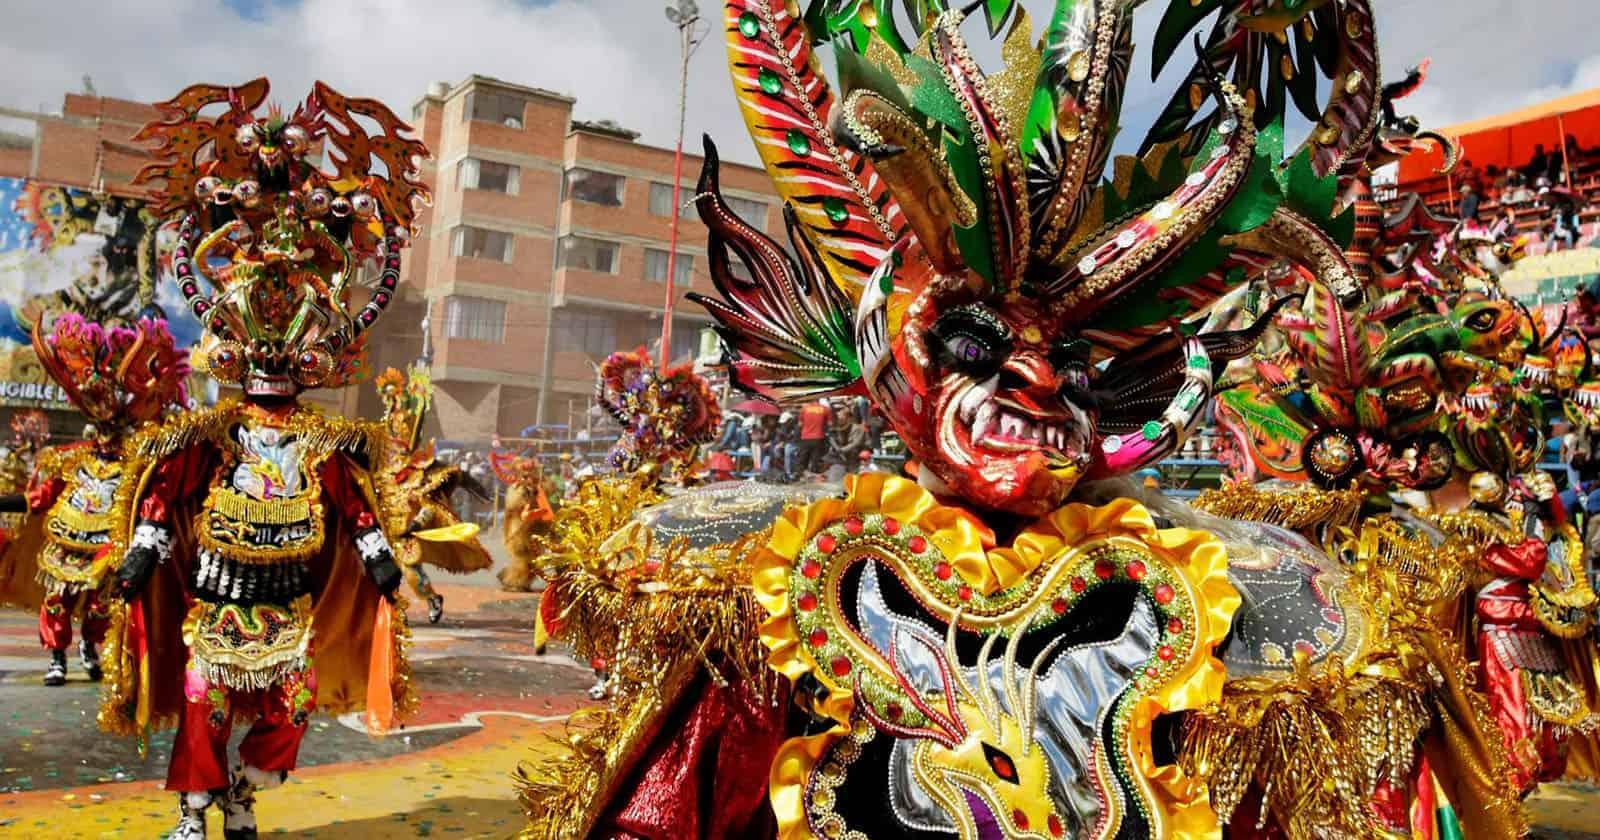 Dancers at the Carnaval de Oruro in Bolivia